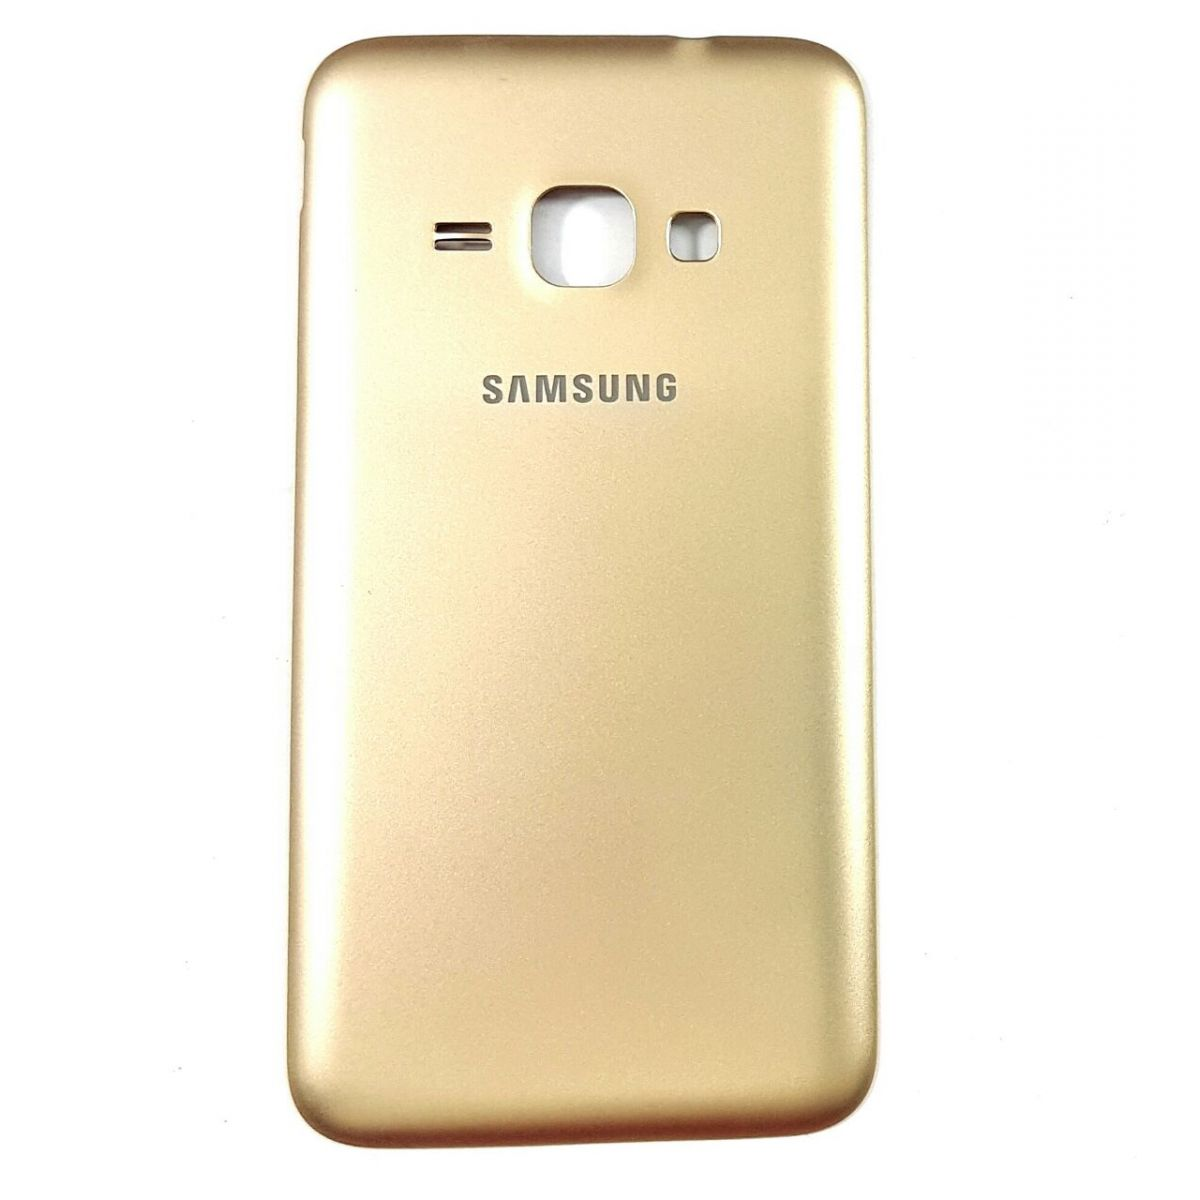 Tampa Traseira Samsung J1 2016 Sm-J120 Gold Dourado